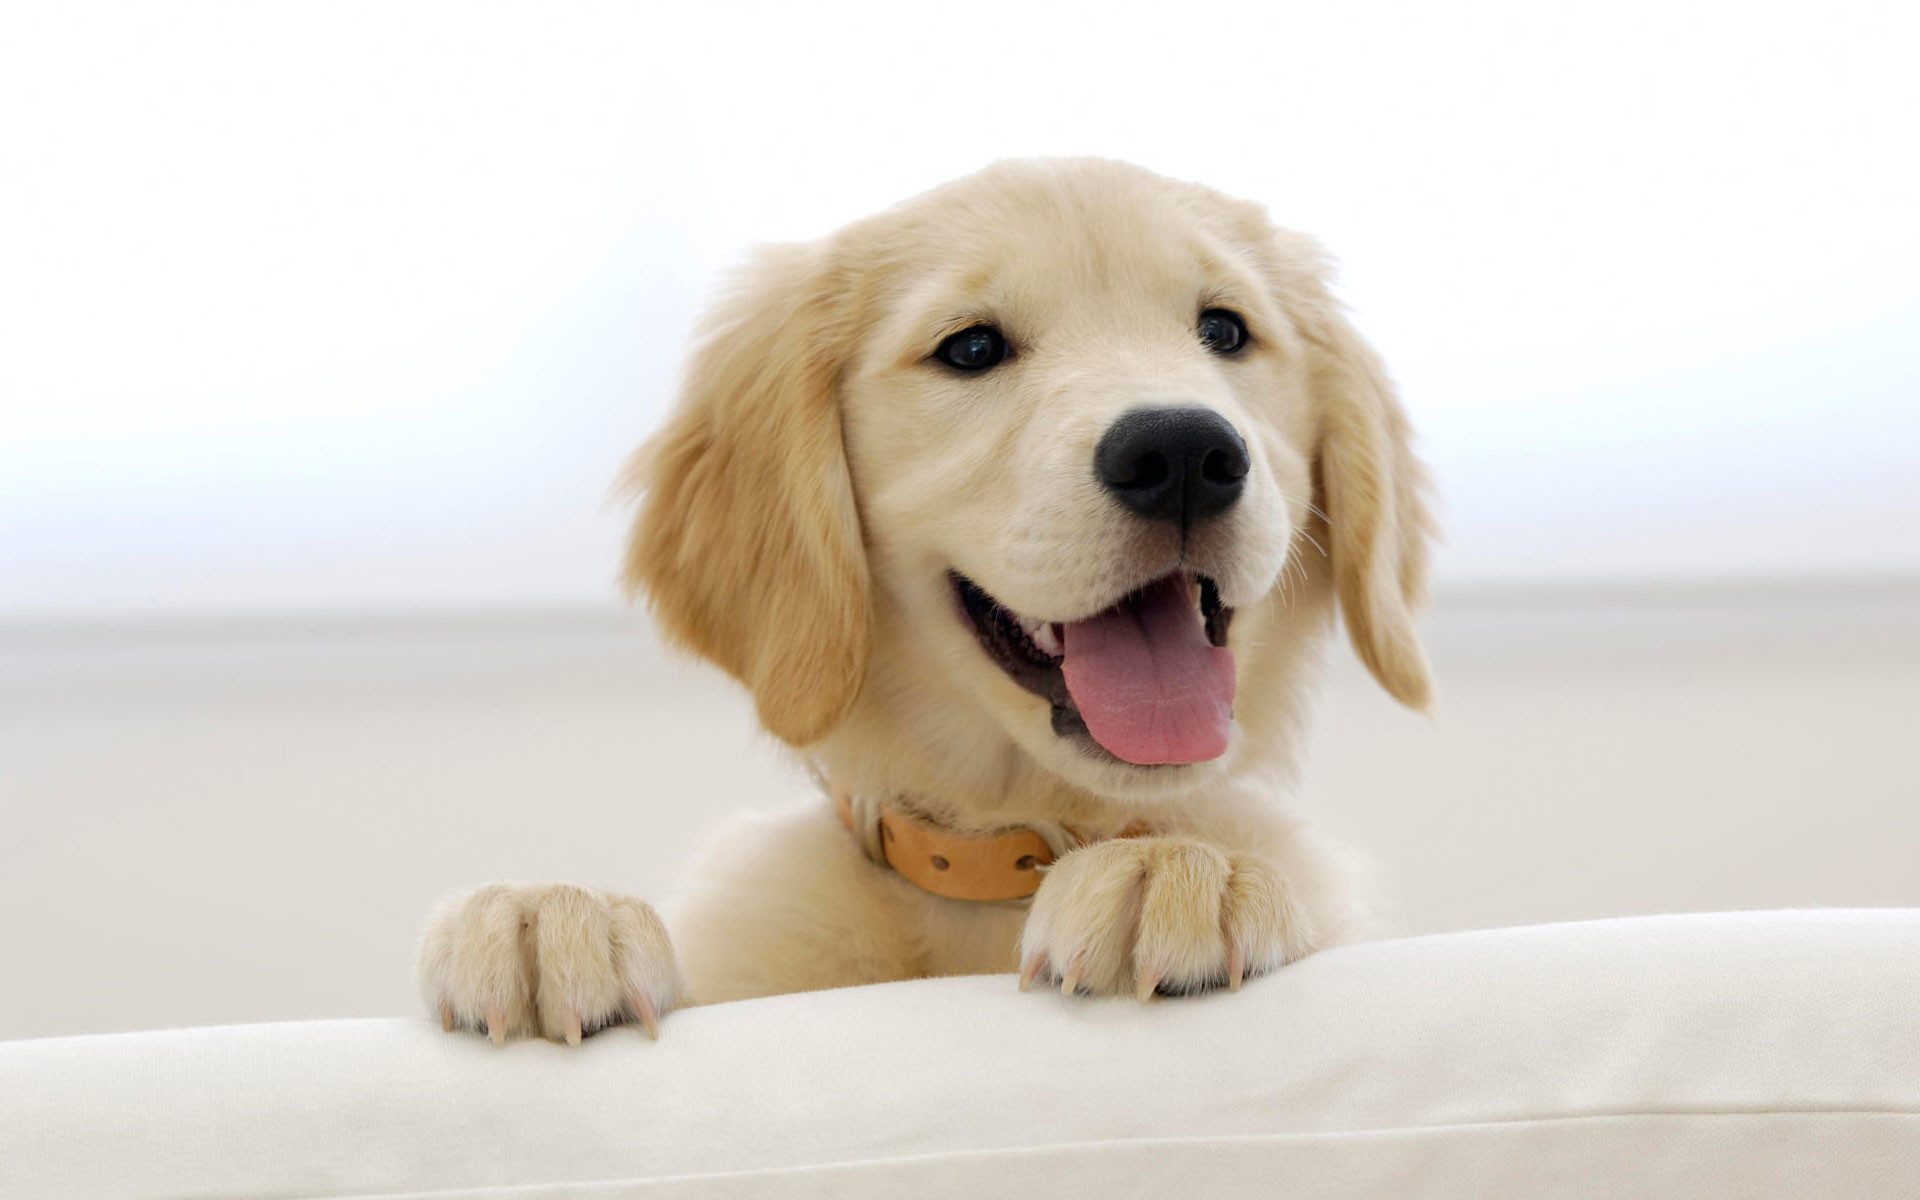 1920x1200 Golden Retriever Puppy